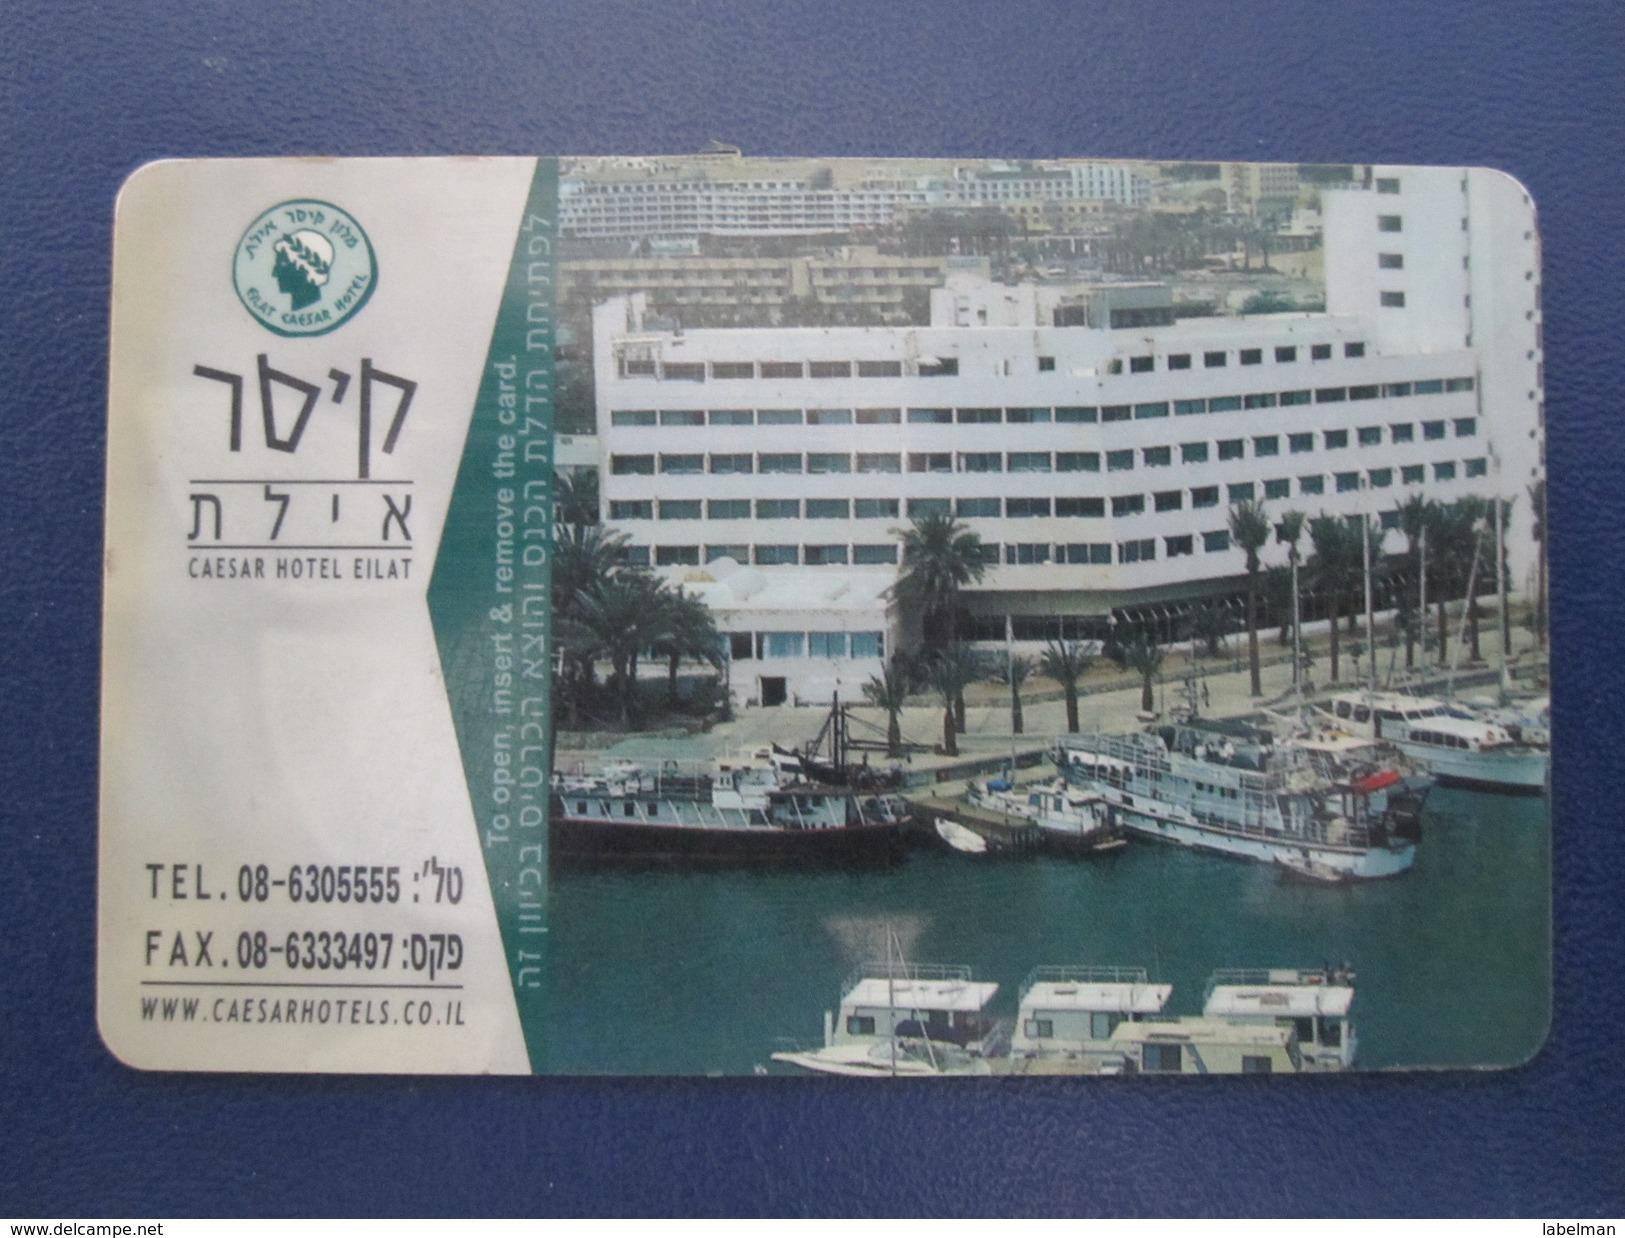 HOTEL MOTEL INN PENSION MOTOR HOUSE CAESAR PREMIER TIBERIAS DEAD SEA HAIFA JERUSALEM TIBERIAS EILAT KEY CARD ISRAEL - Hotel Labels